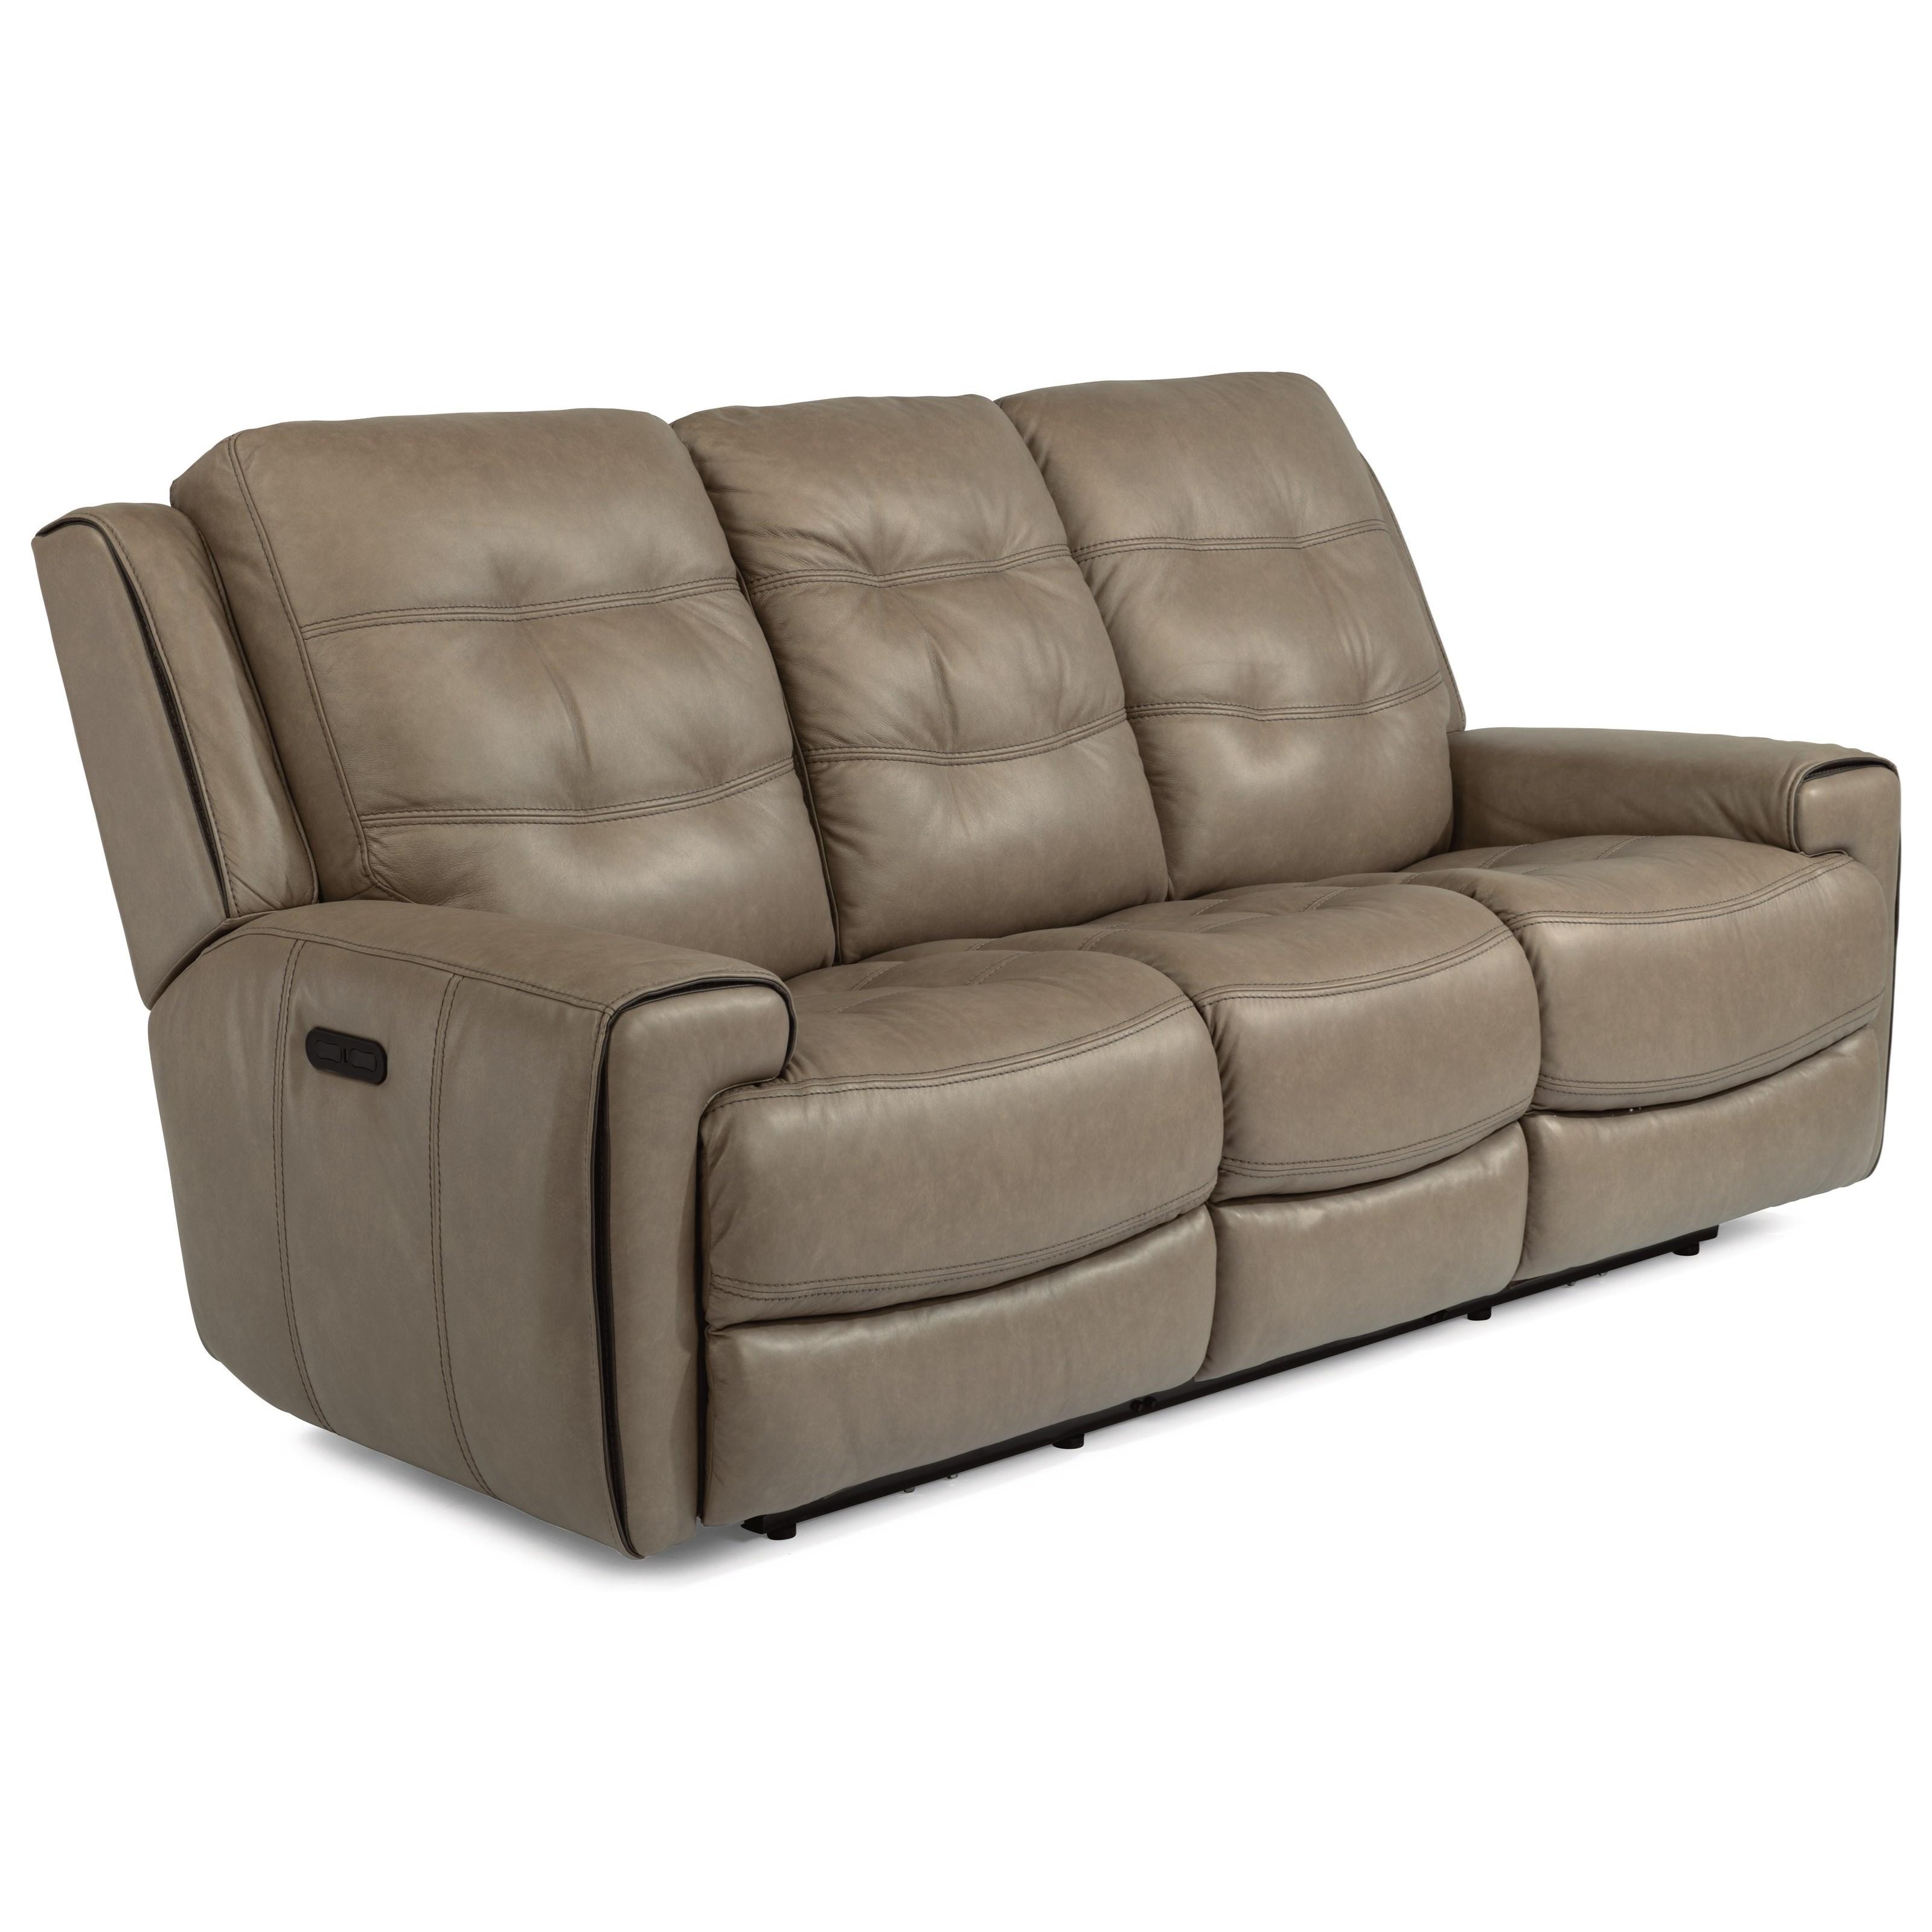 flexsteel latitudes wicklow 1681 62ph power reclining lay flat sofa rh dunkandbright com flexsteel reclining sofa for sale flexsteel reclining sofa parts